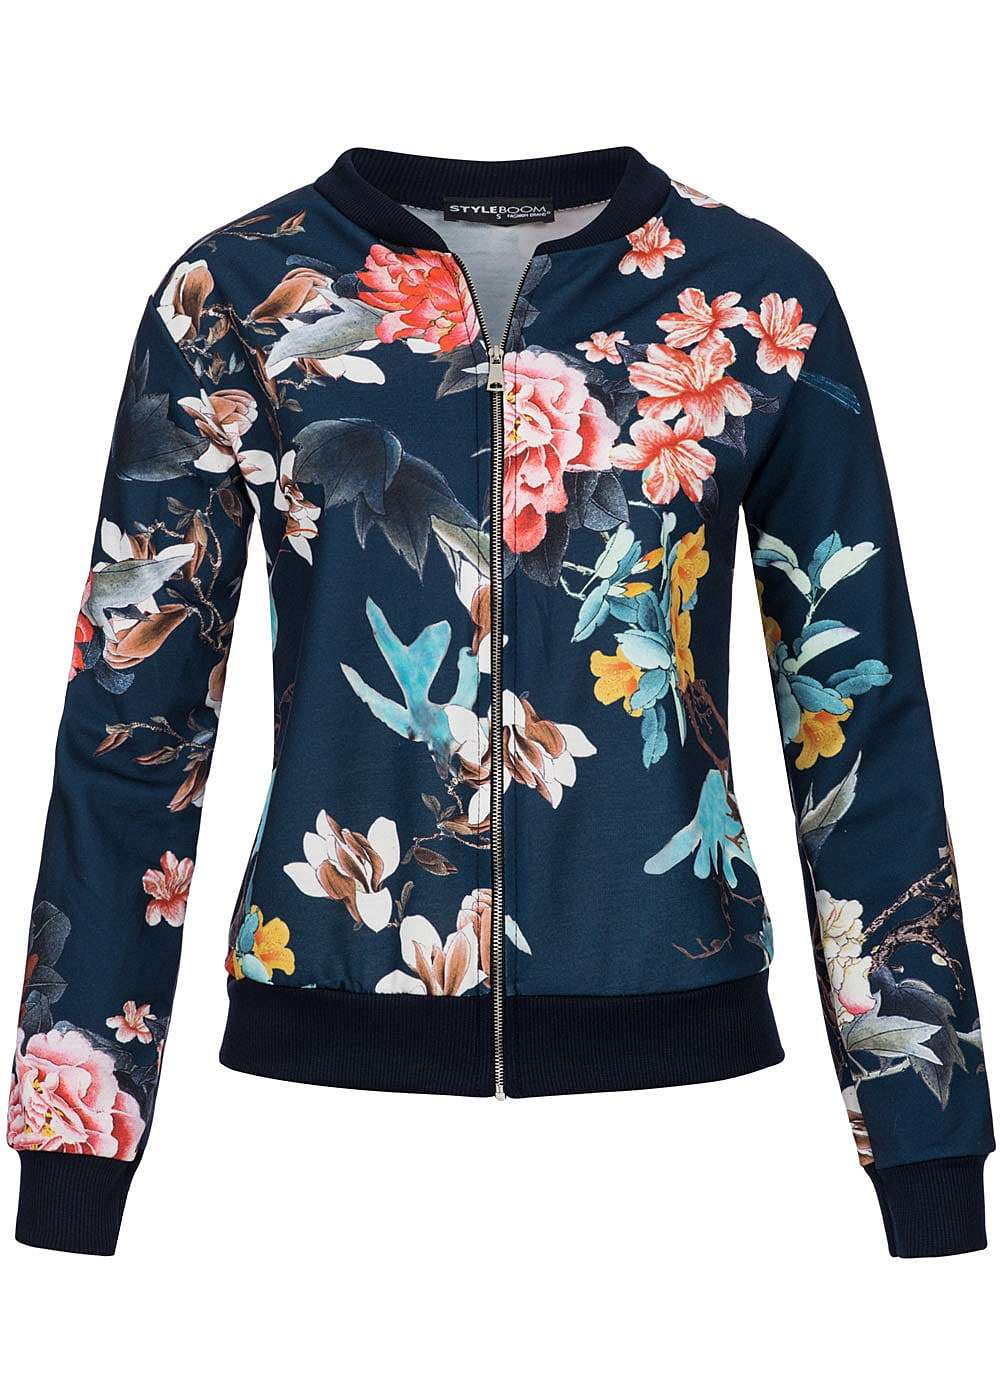 styleboom fashion damen bomber jacke blumen kolibri print zipper silberfarben navy 77onlineshop. Black Bedroom Furniture Sets. Home Design Ideas